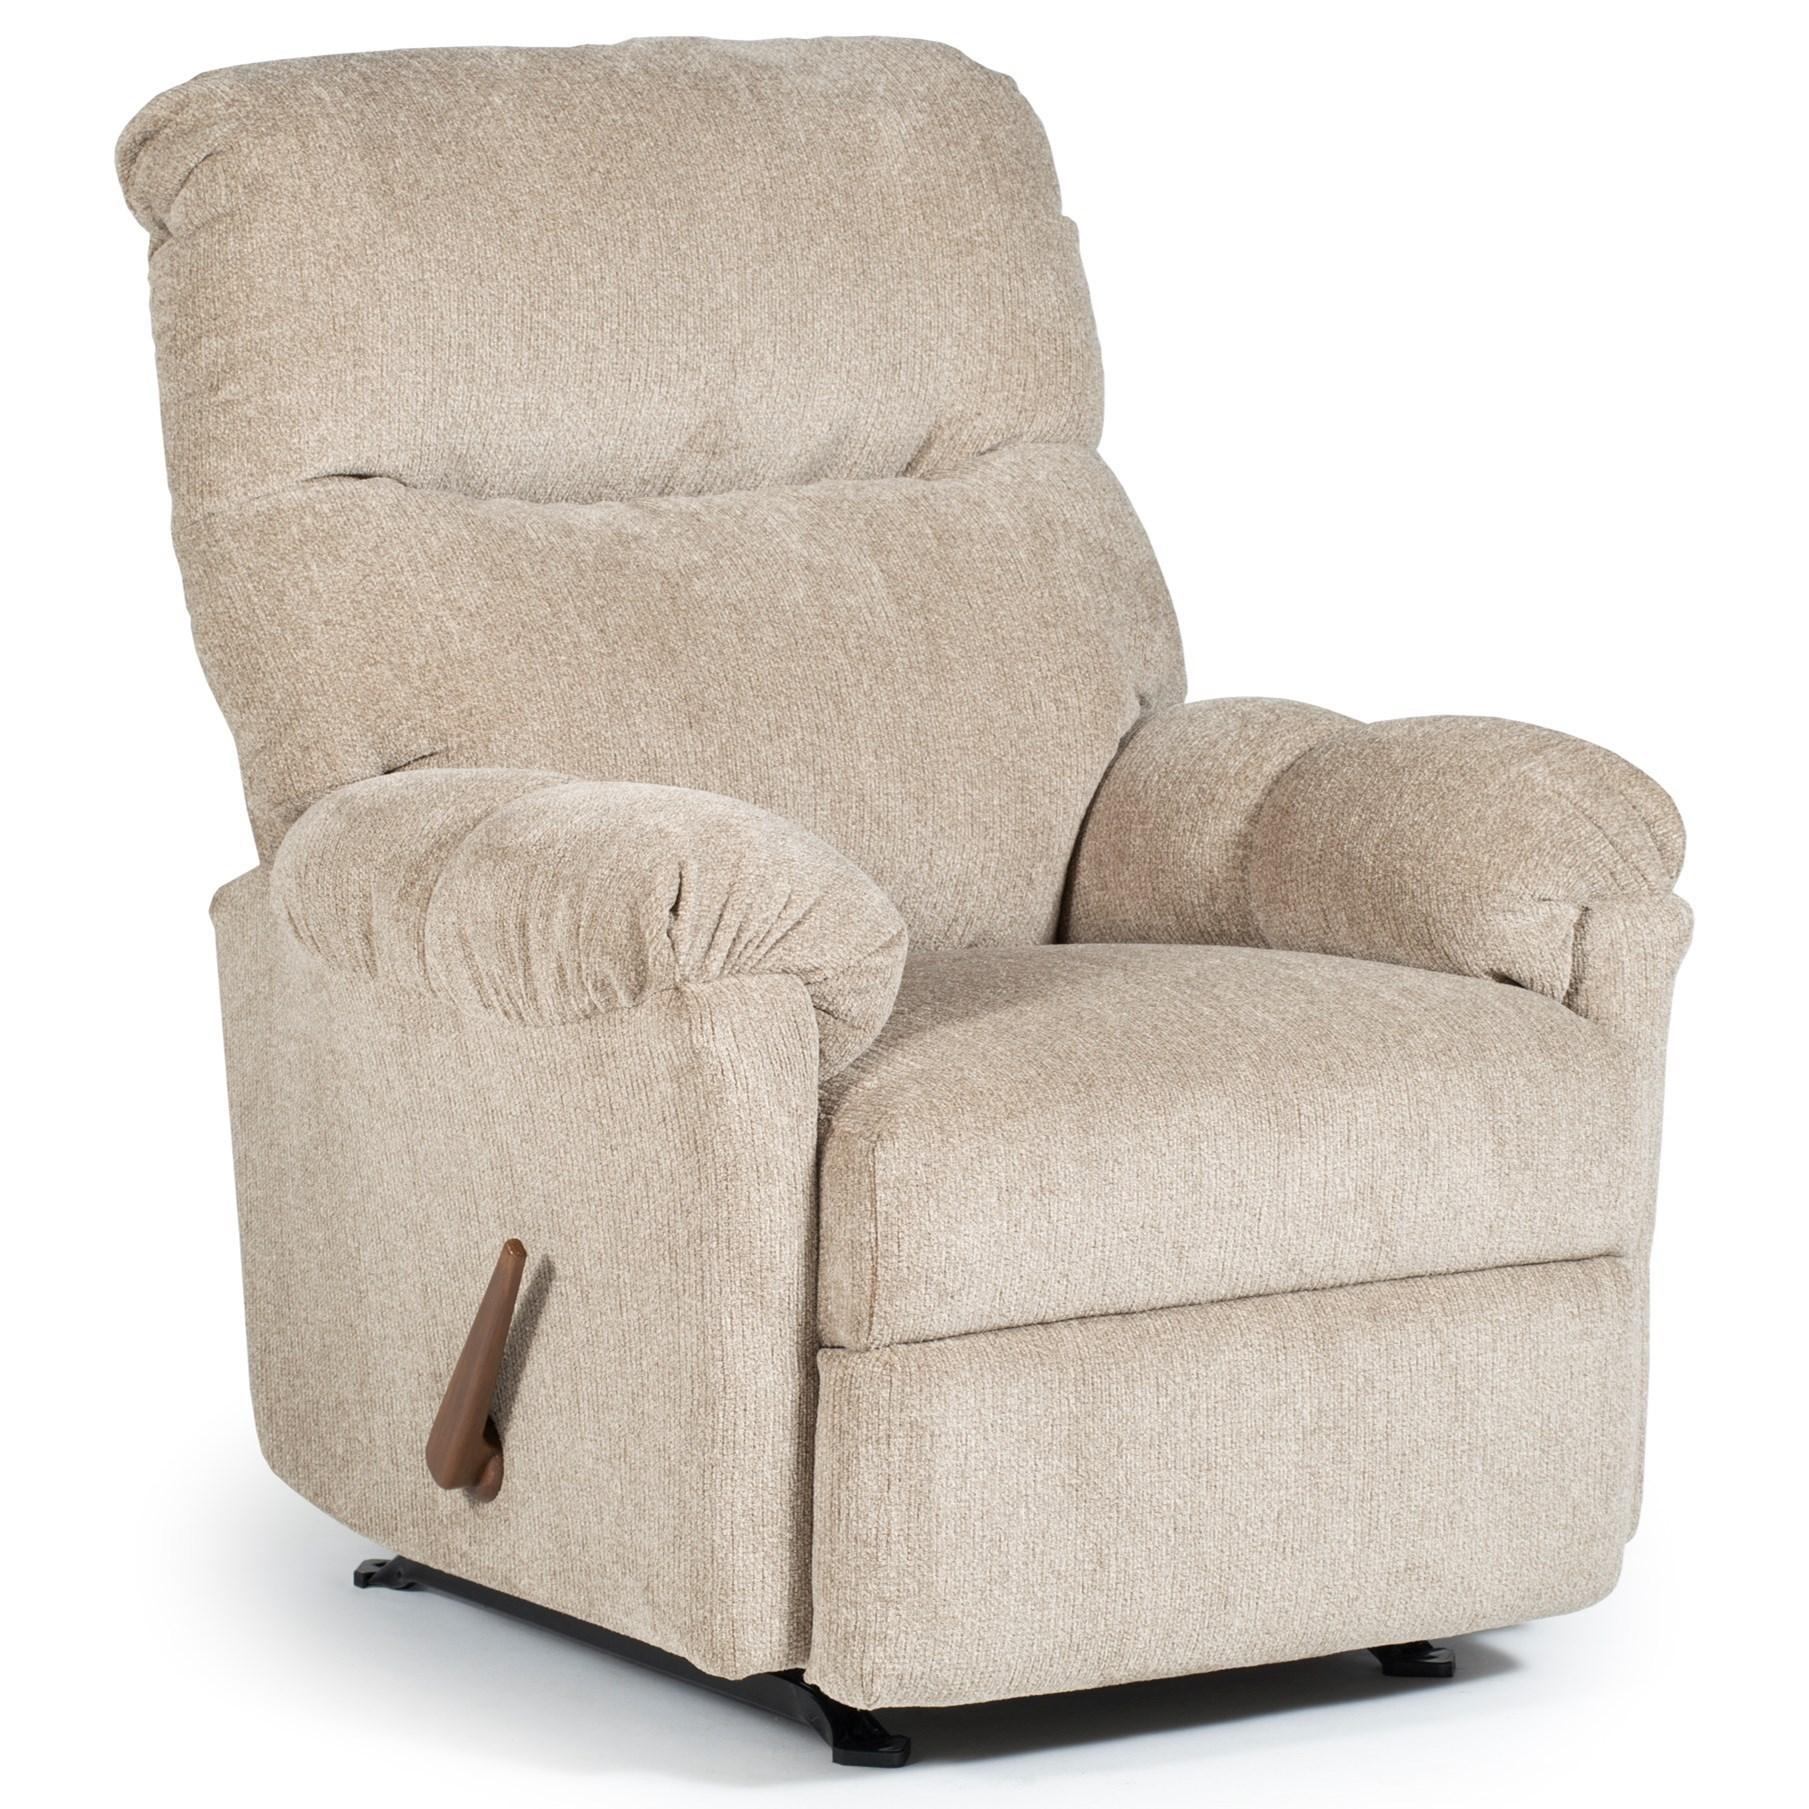 Best Home Furnishings Recliners Medium 2nw69 Balmore Swivel Rocking Reclining Chair Baer 39 S